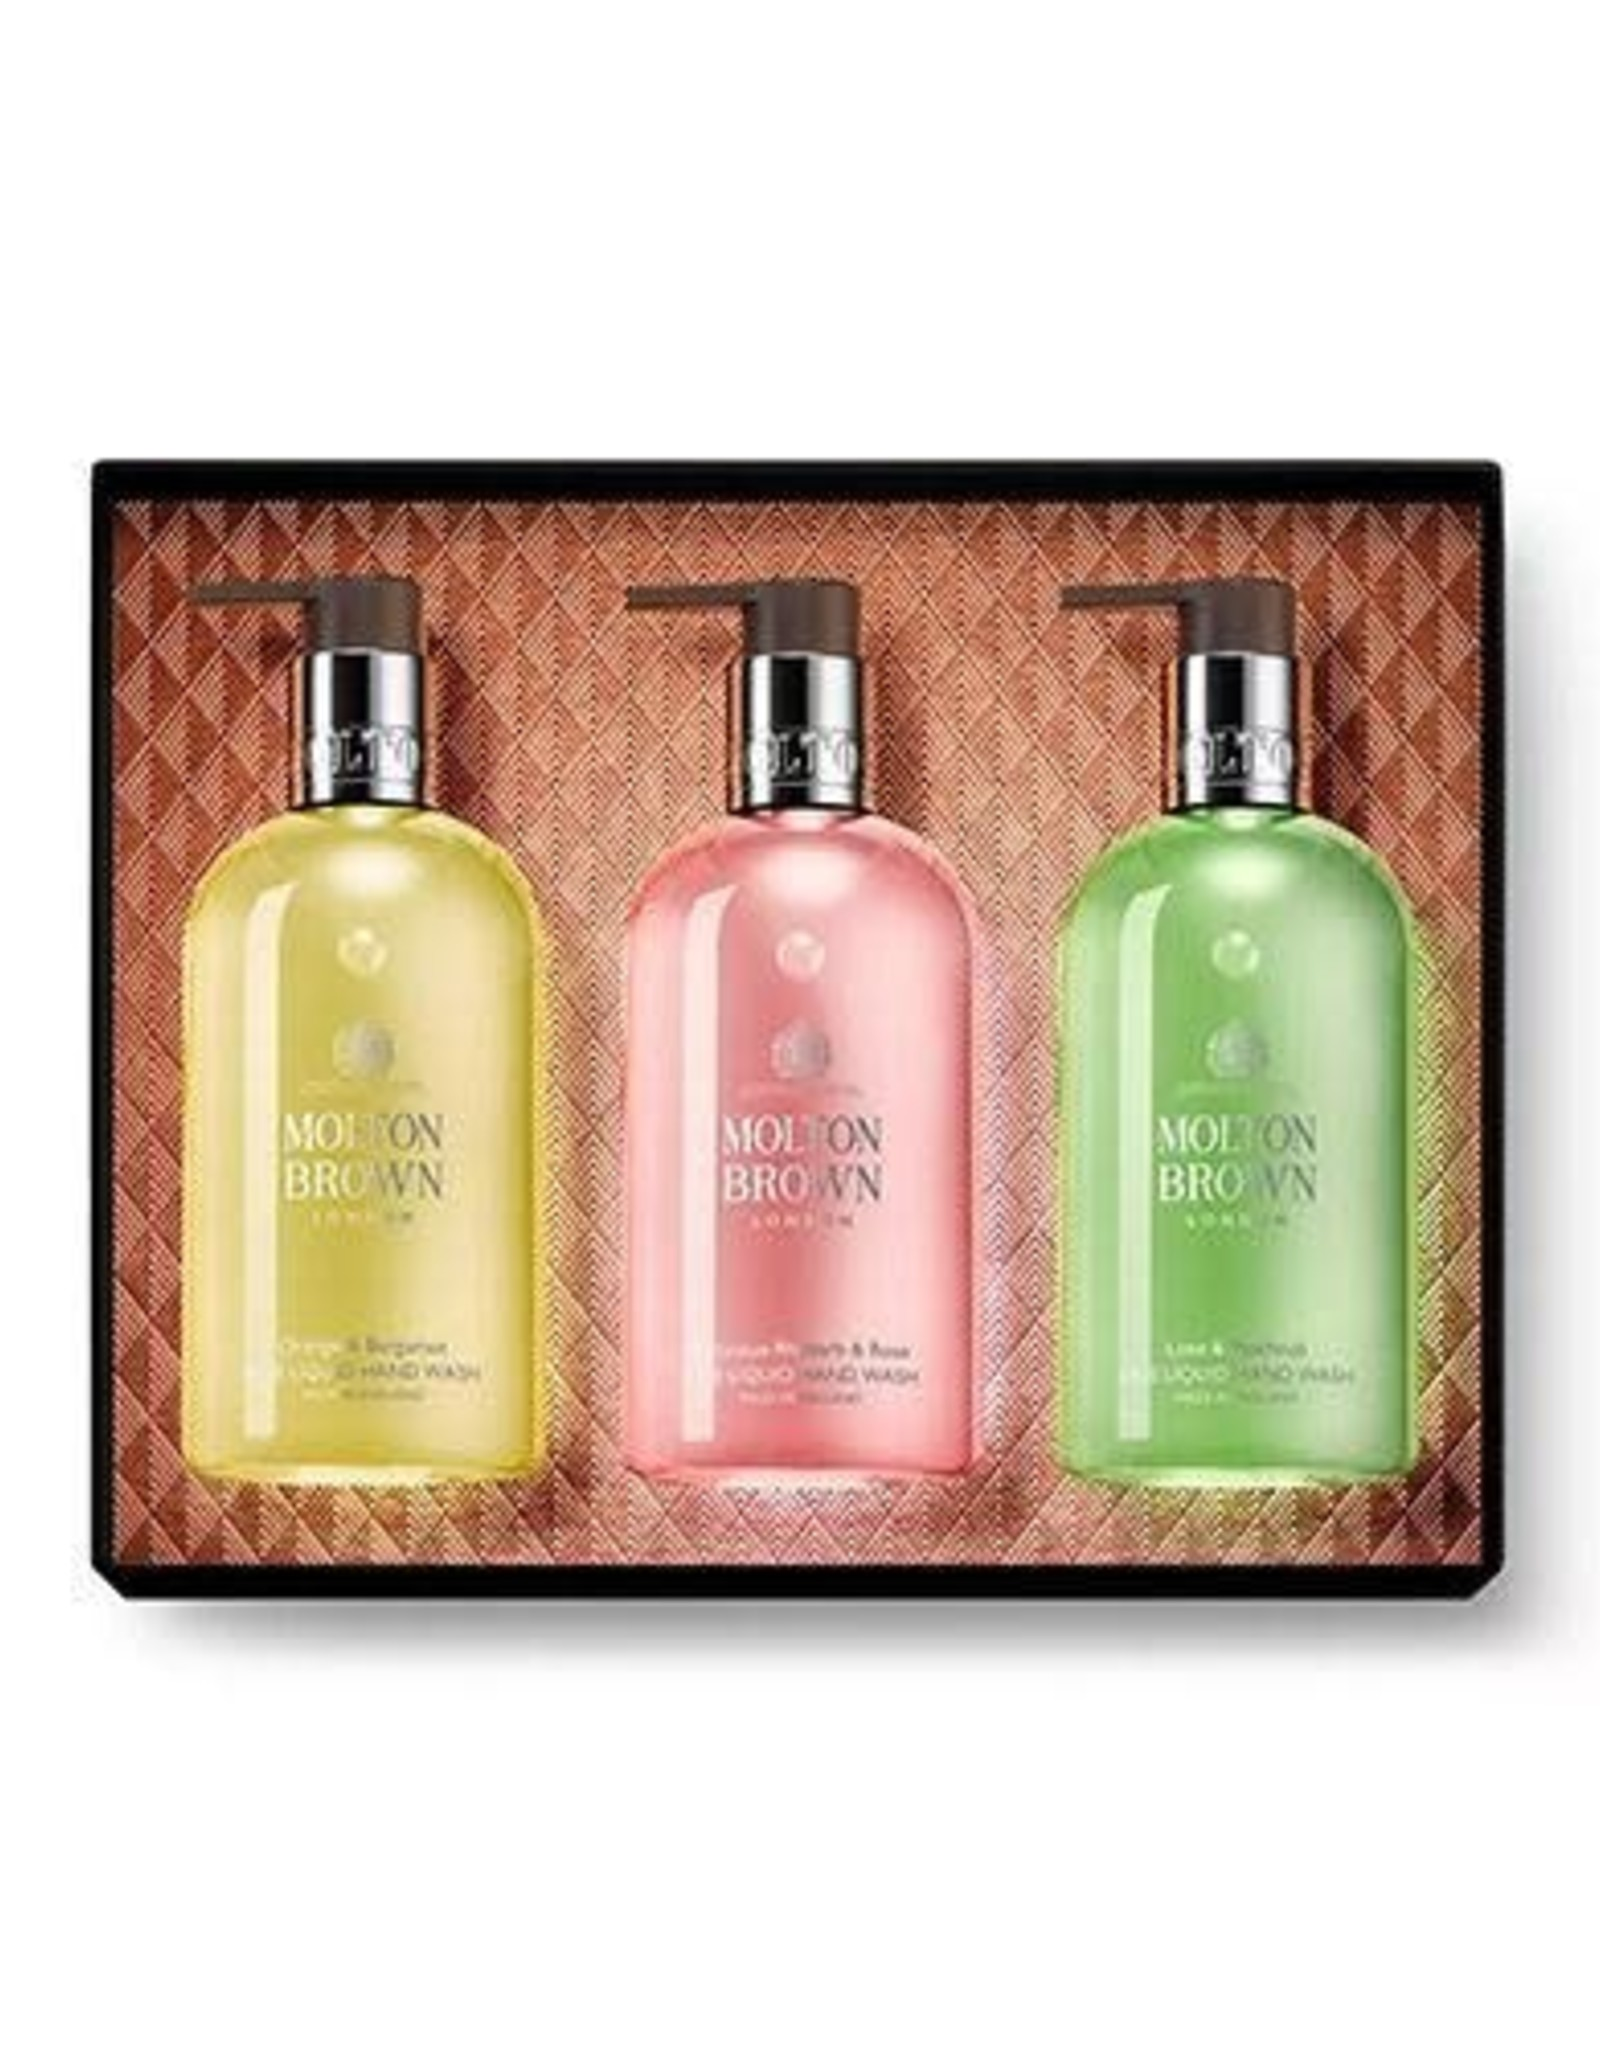 Molton Brown Hand Wash Trio